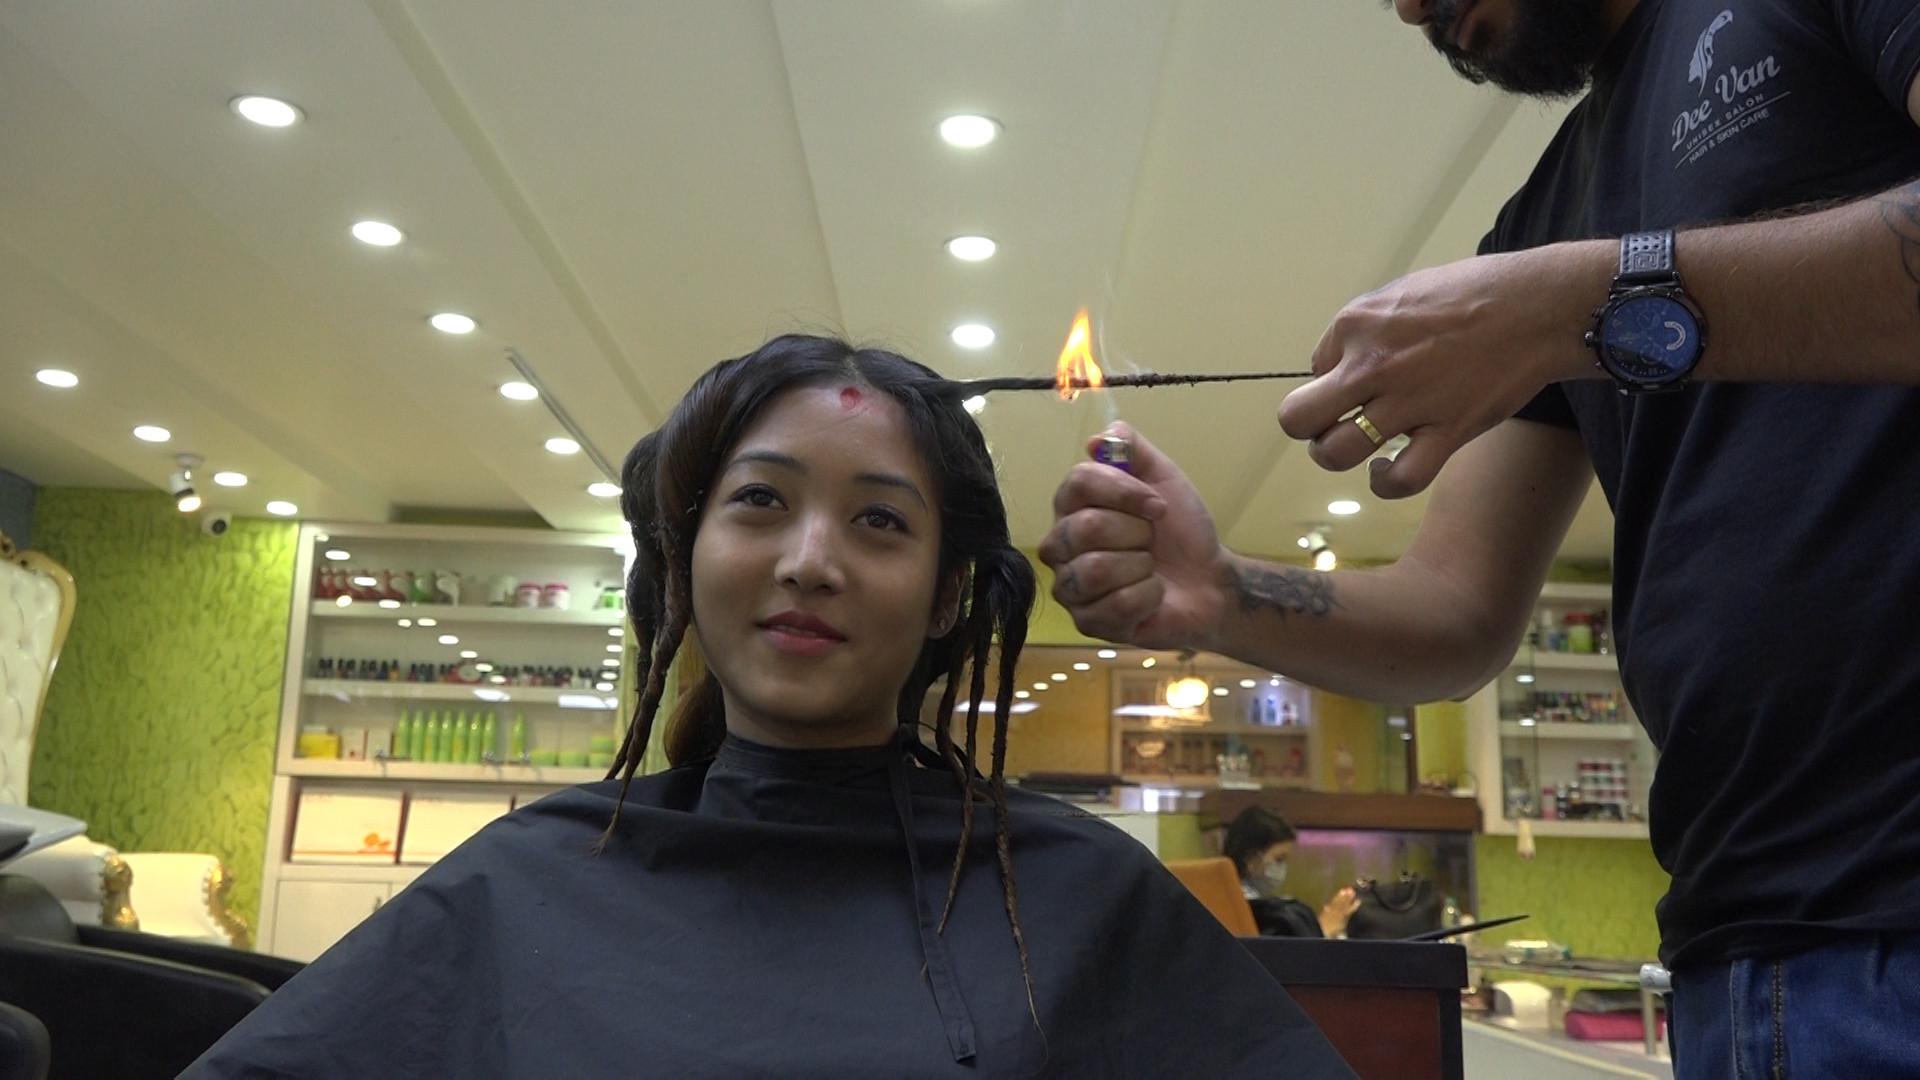 https://img.setopati.org/uploads/images/1568370719fire_hair_cut.jpg